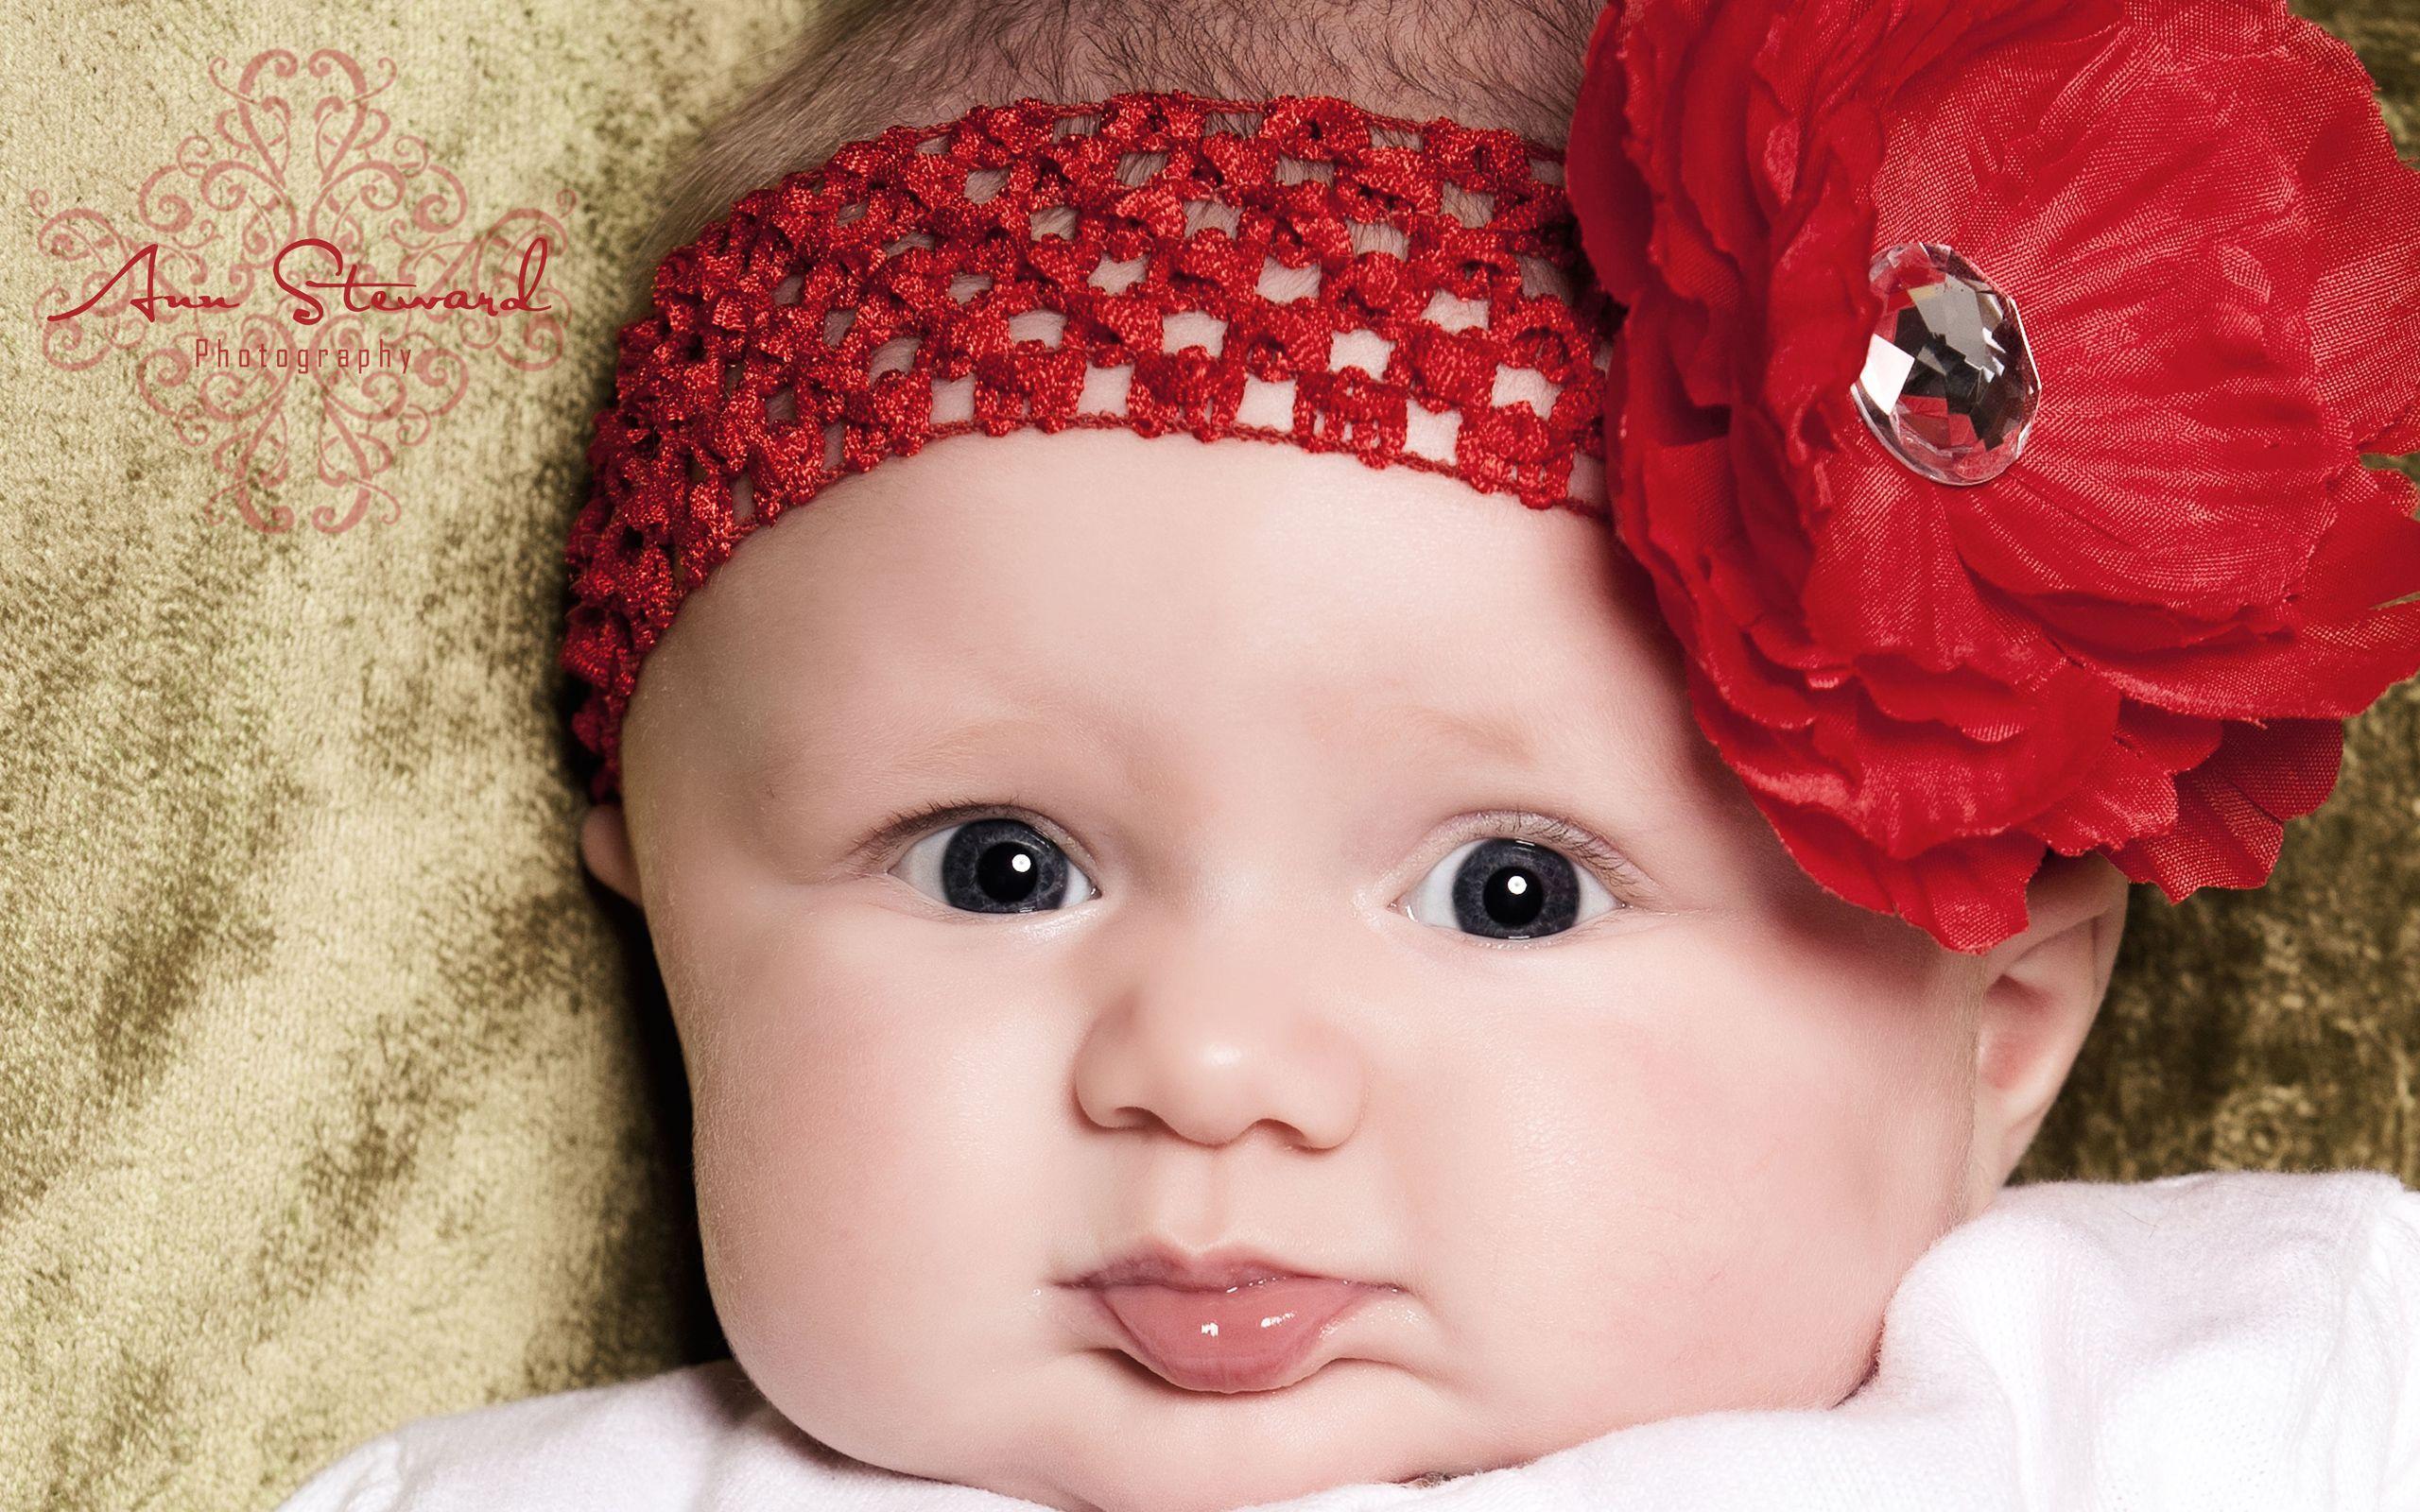 Little Babies Wallpapers Wallpaper Cave